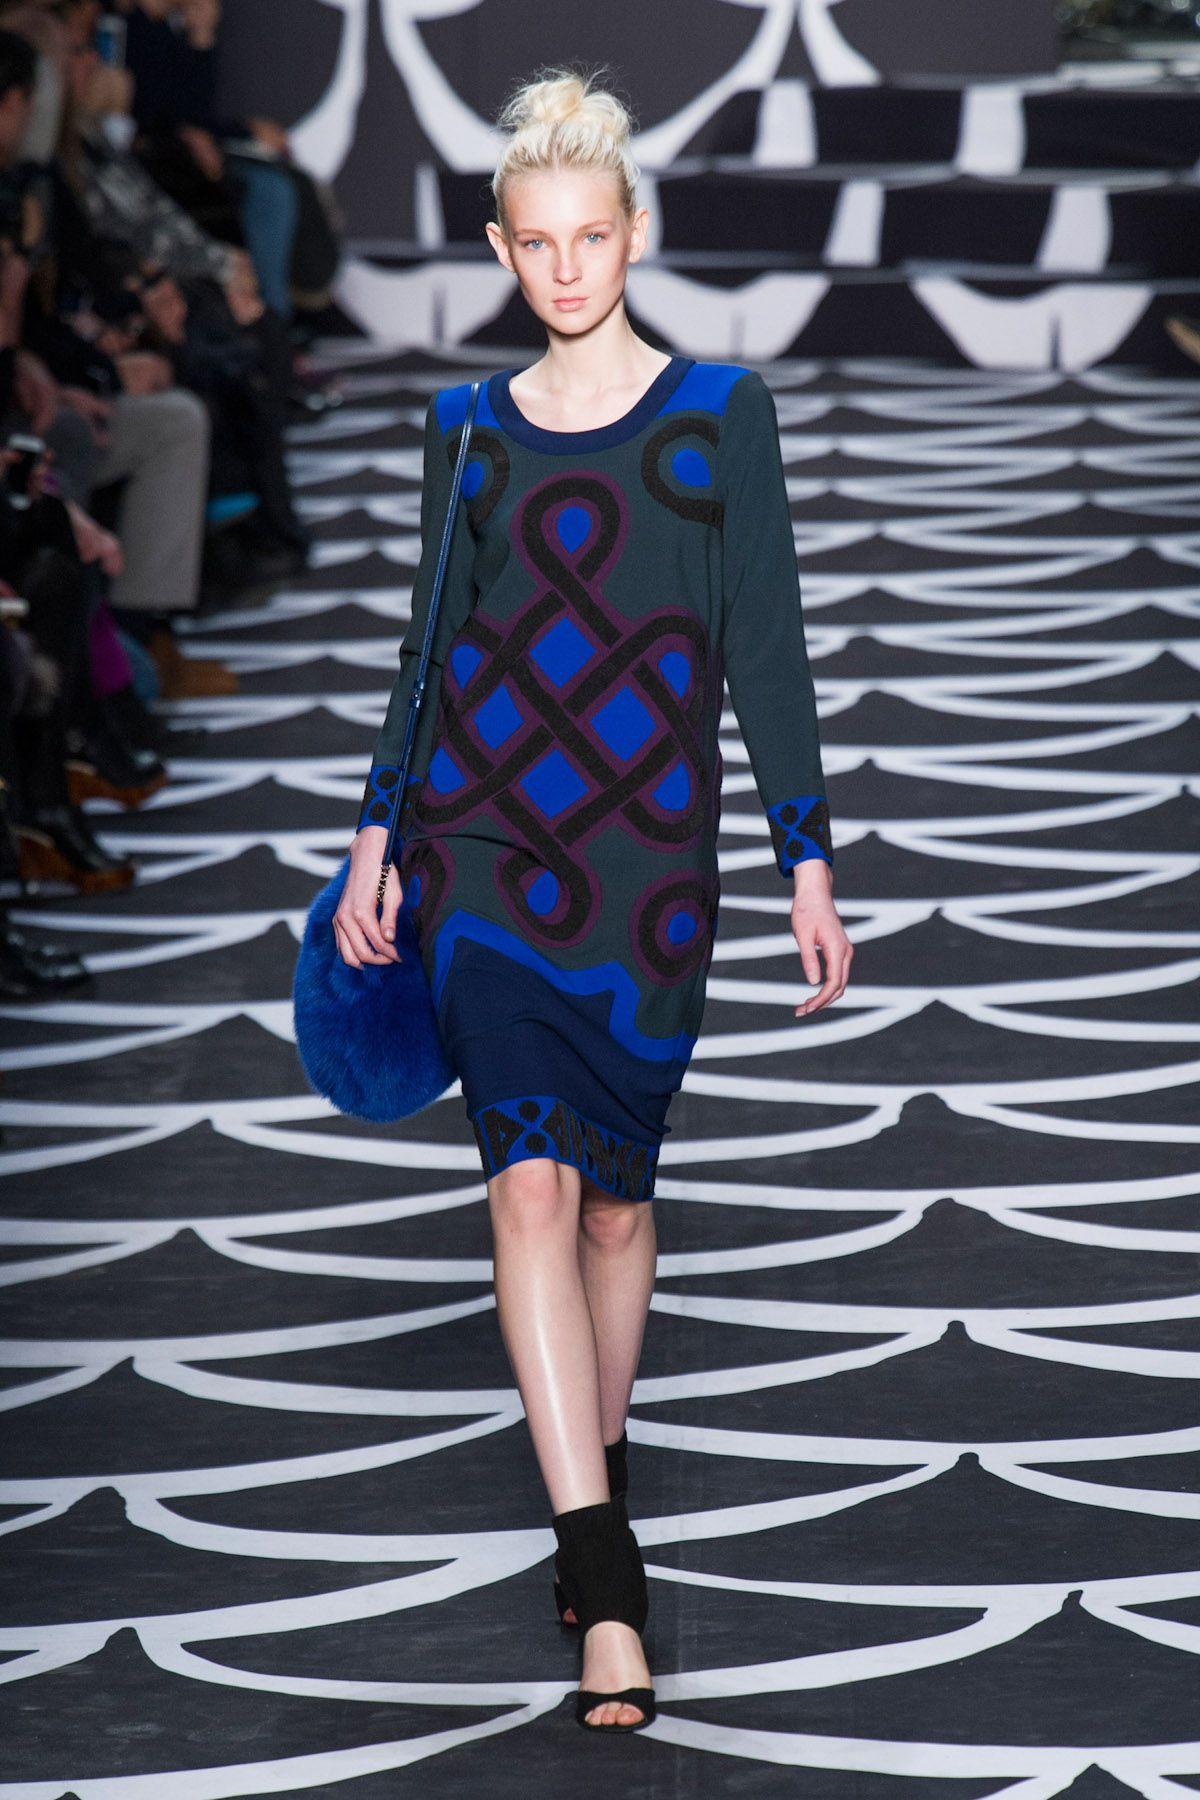 Diane von Furstenberg | Nova York | Inverno 2015 RTW